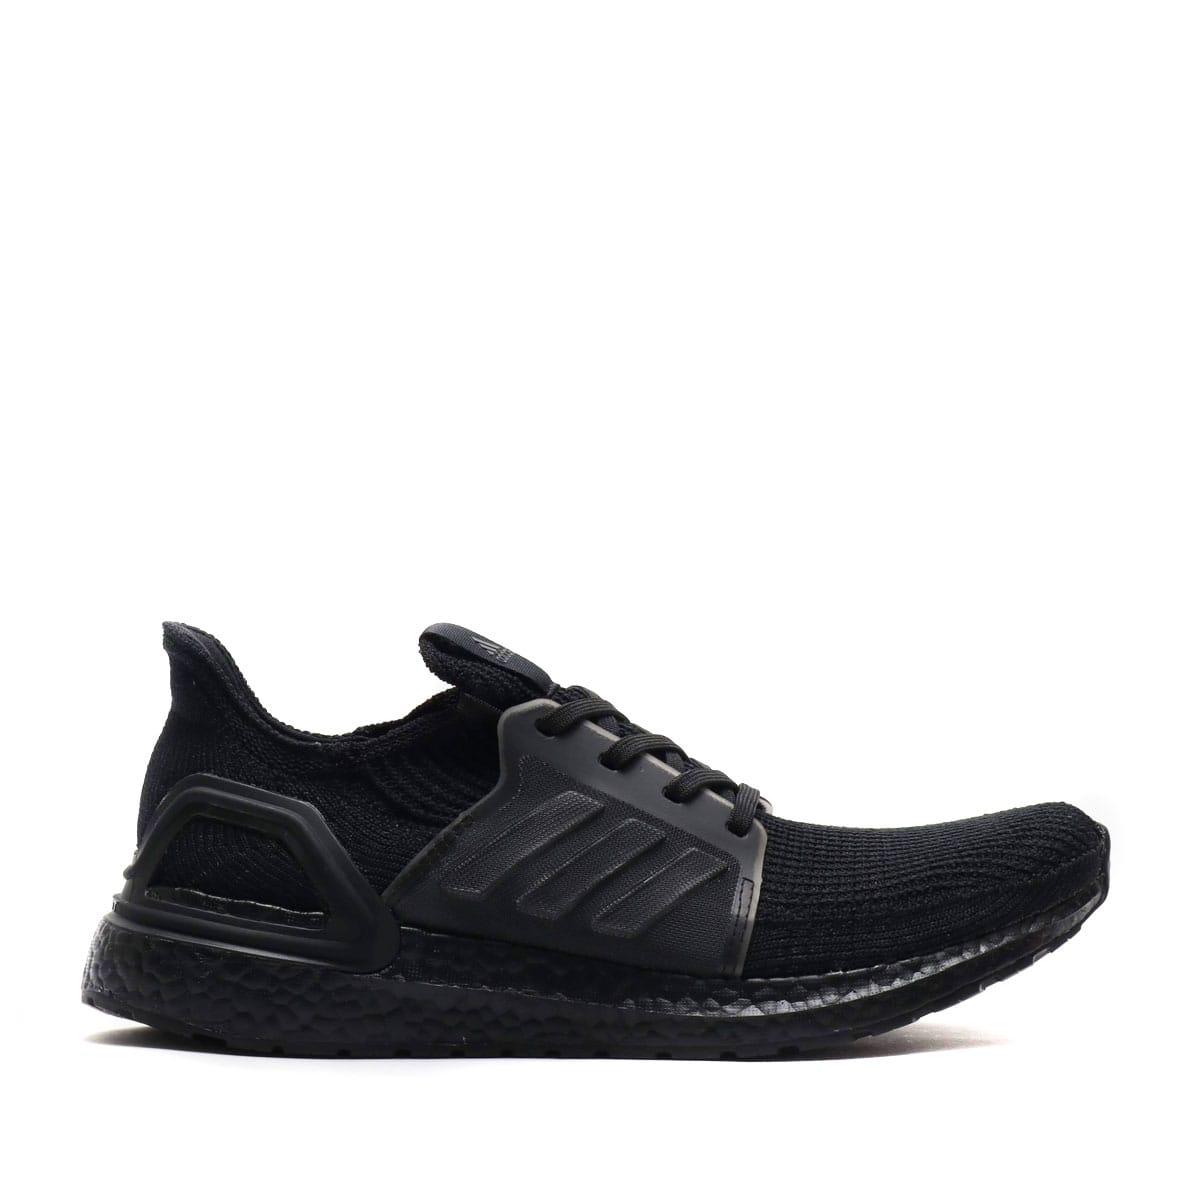 """adidas UltraBOOST 19 CORE BLACK/CORE BLACK/CORE BLACK 19FW-I""_photo_2"